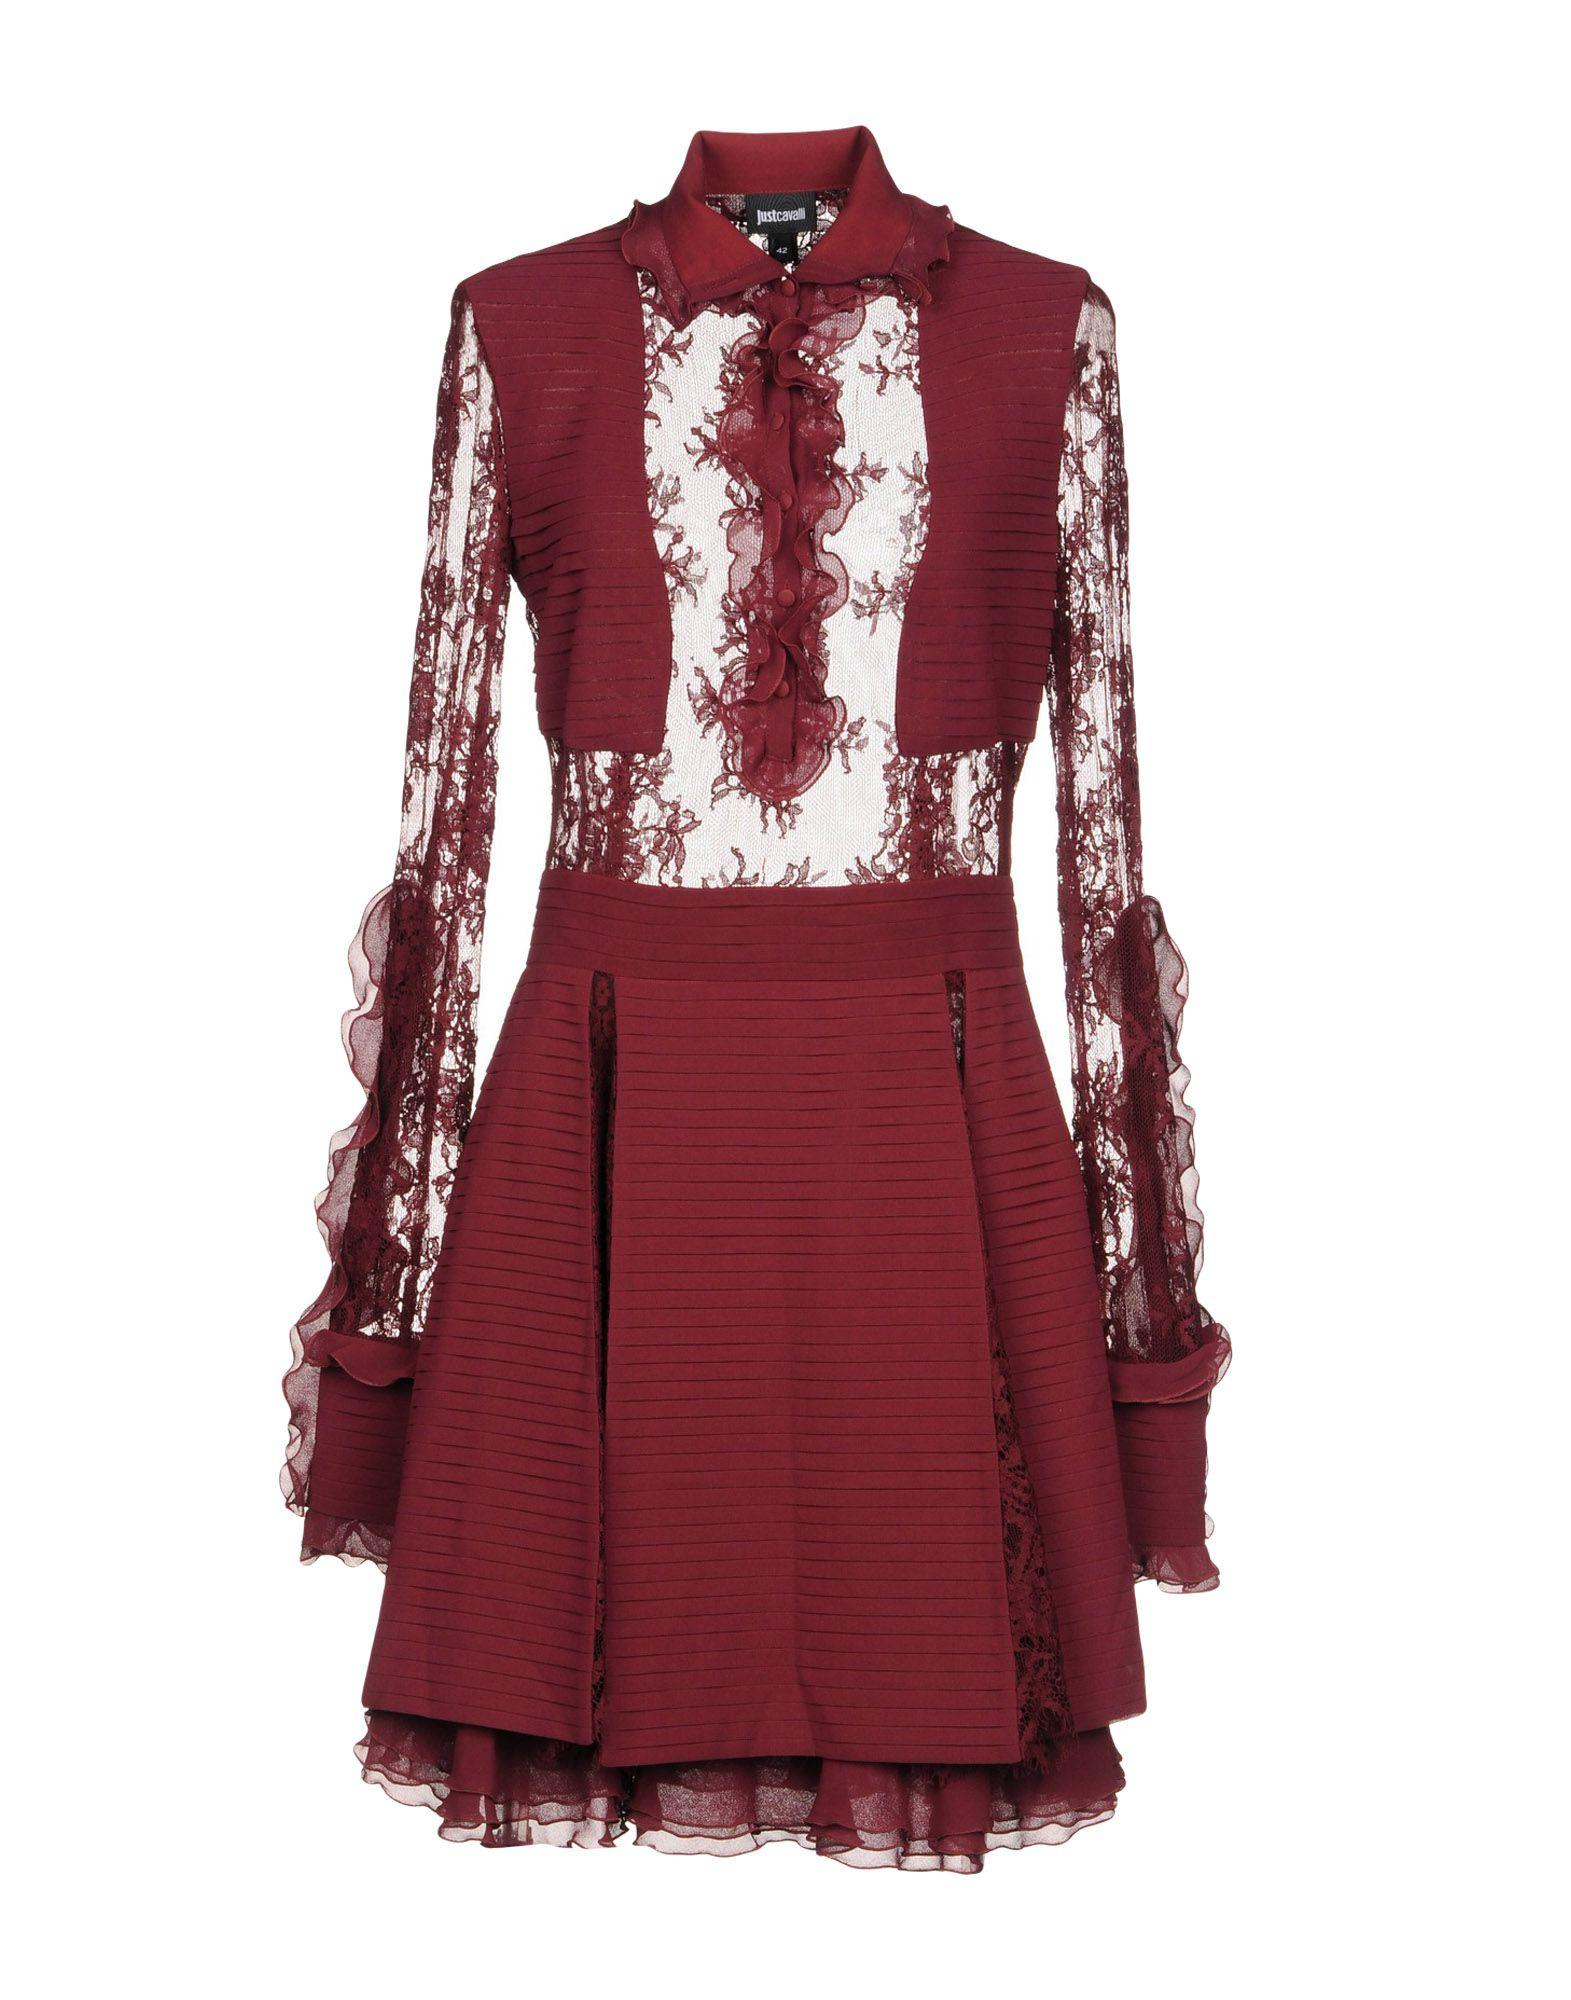 Just Cavalli Short Dresses In Maroon